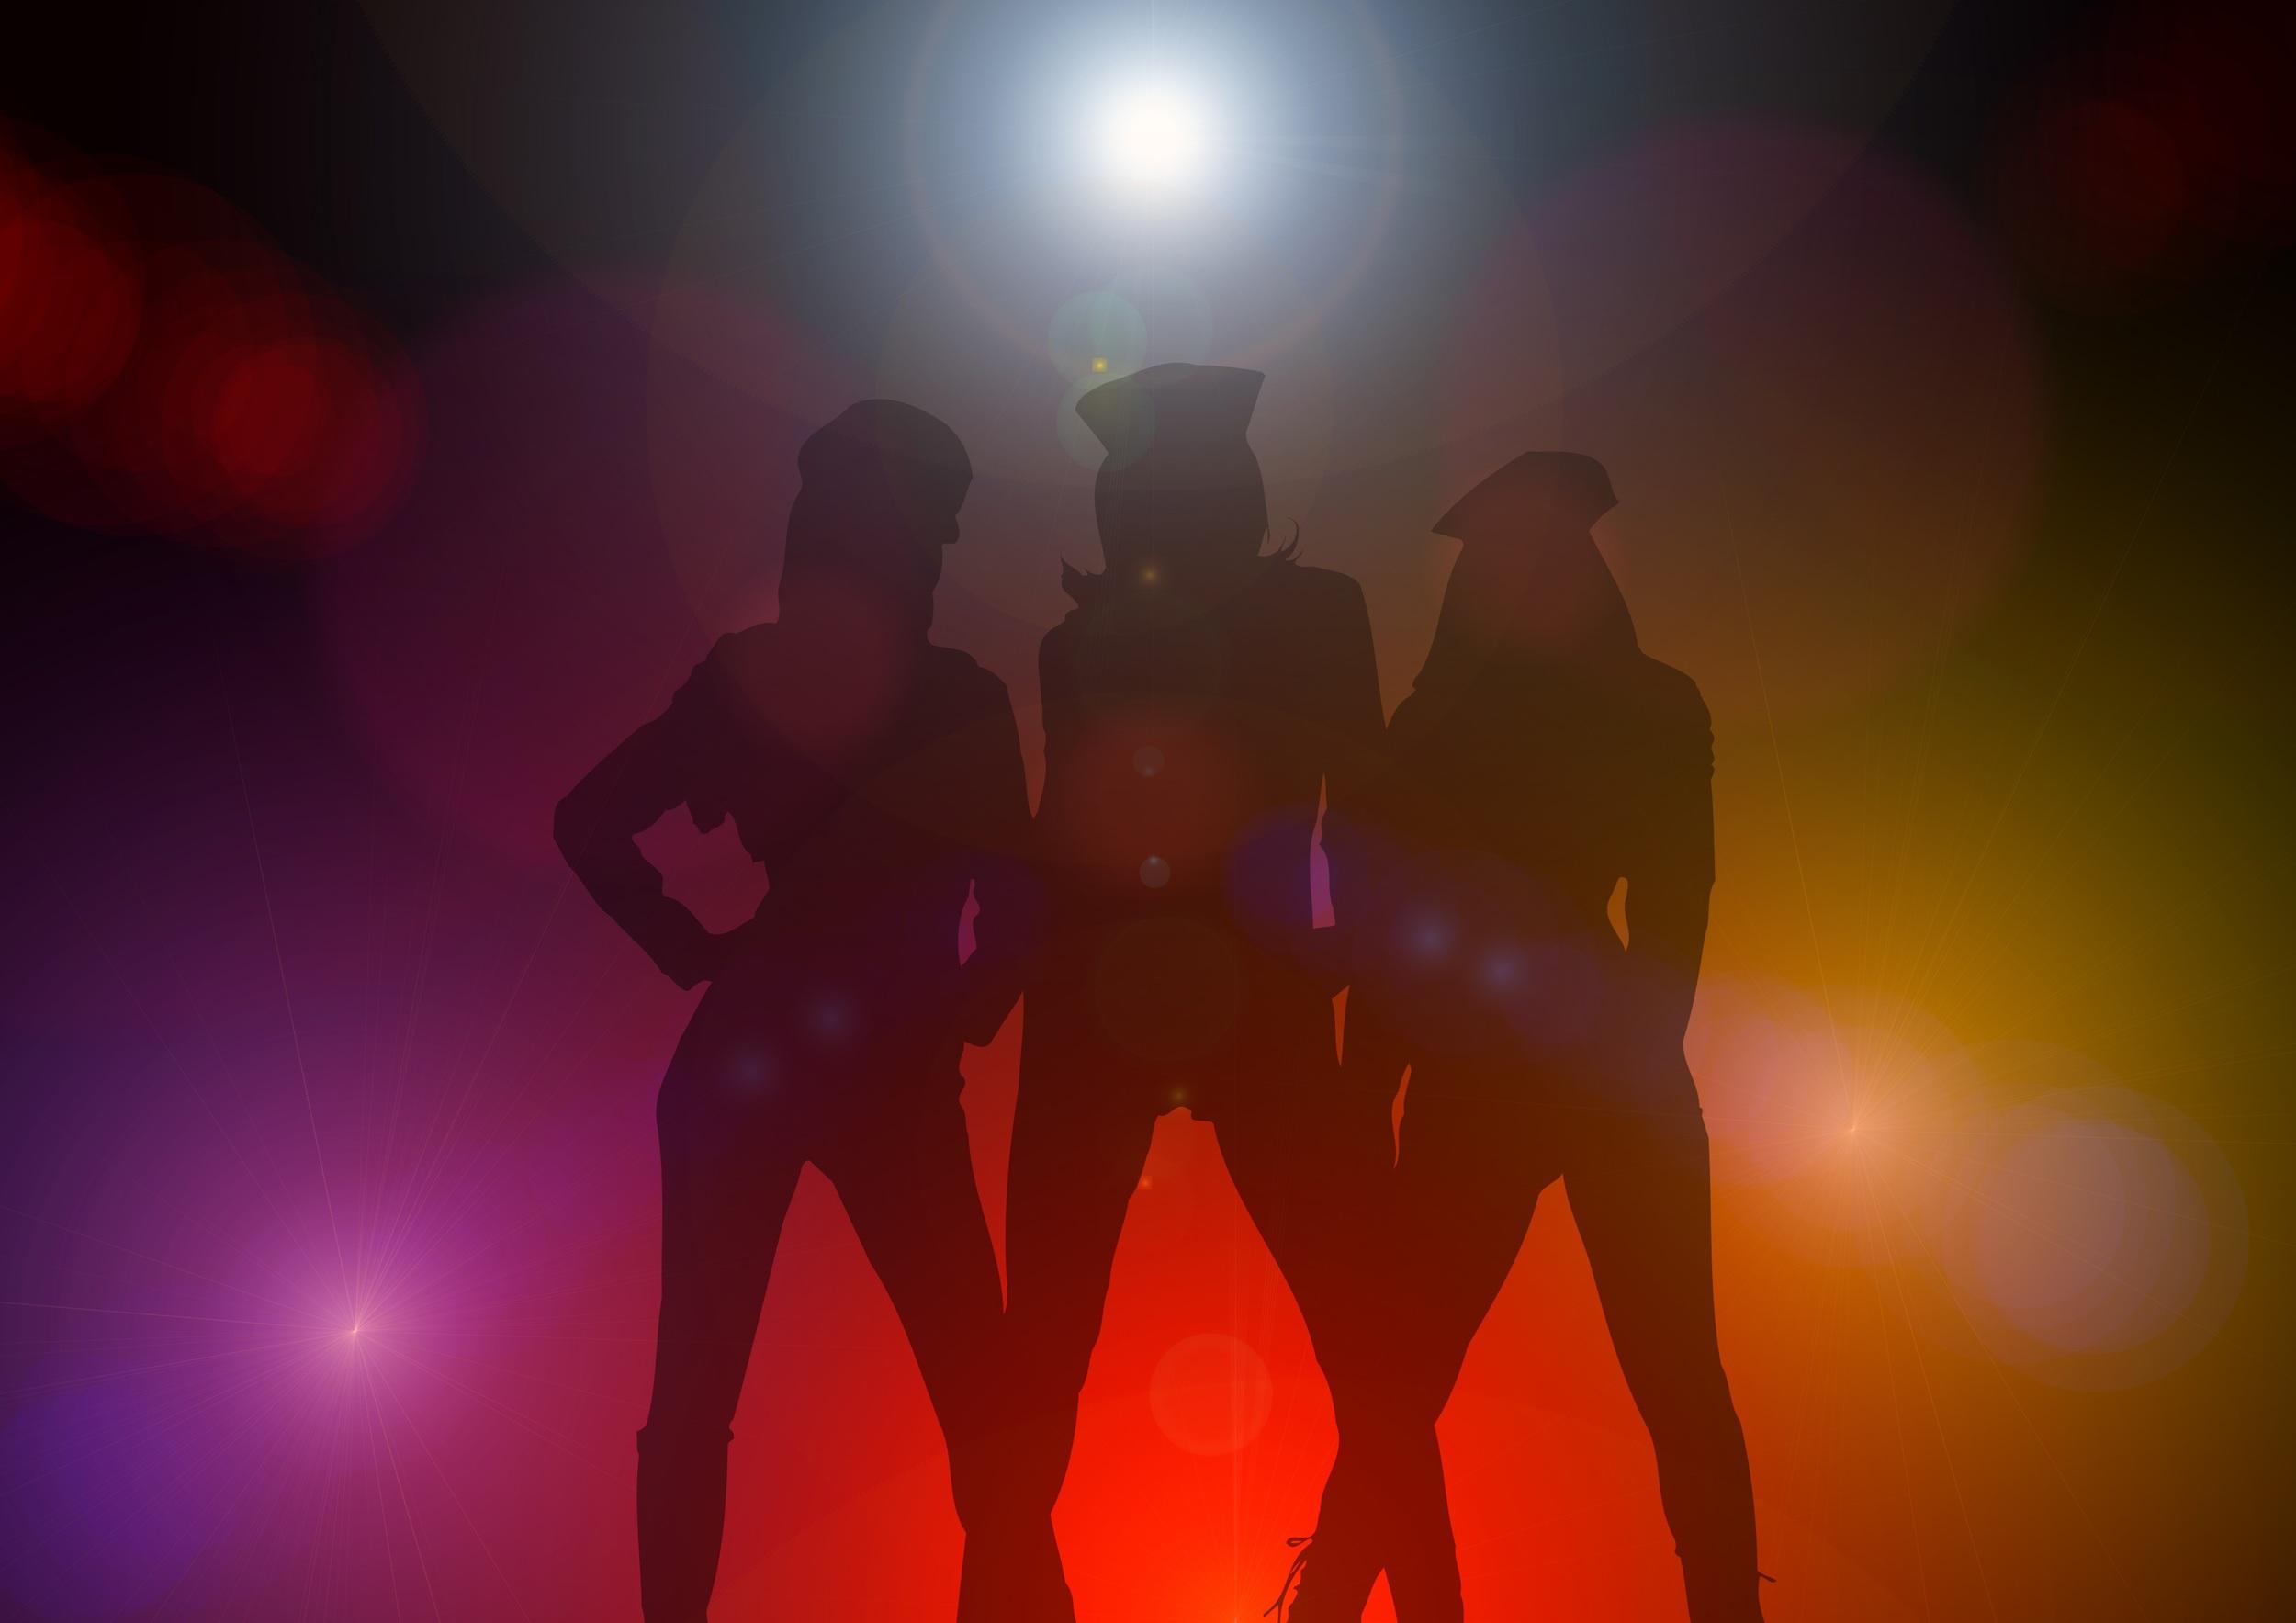 silhouette-702200.jpg